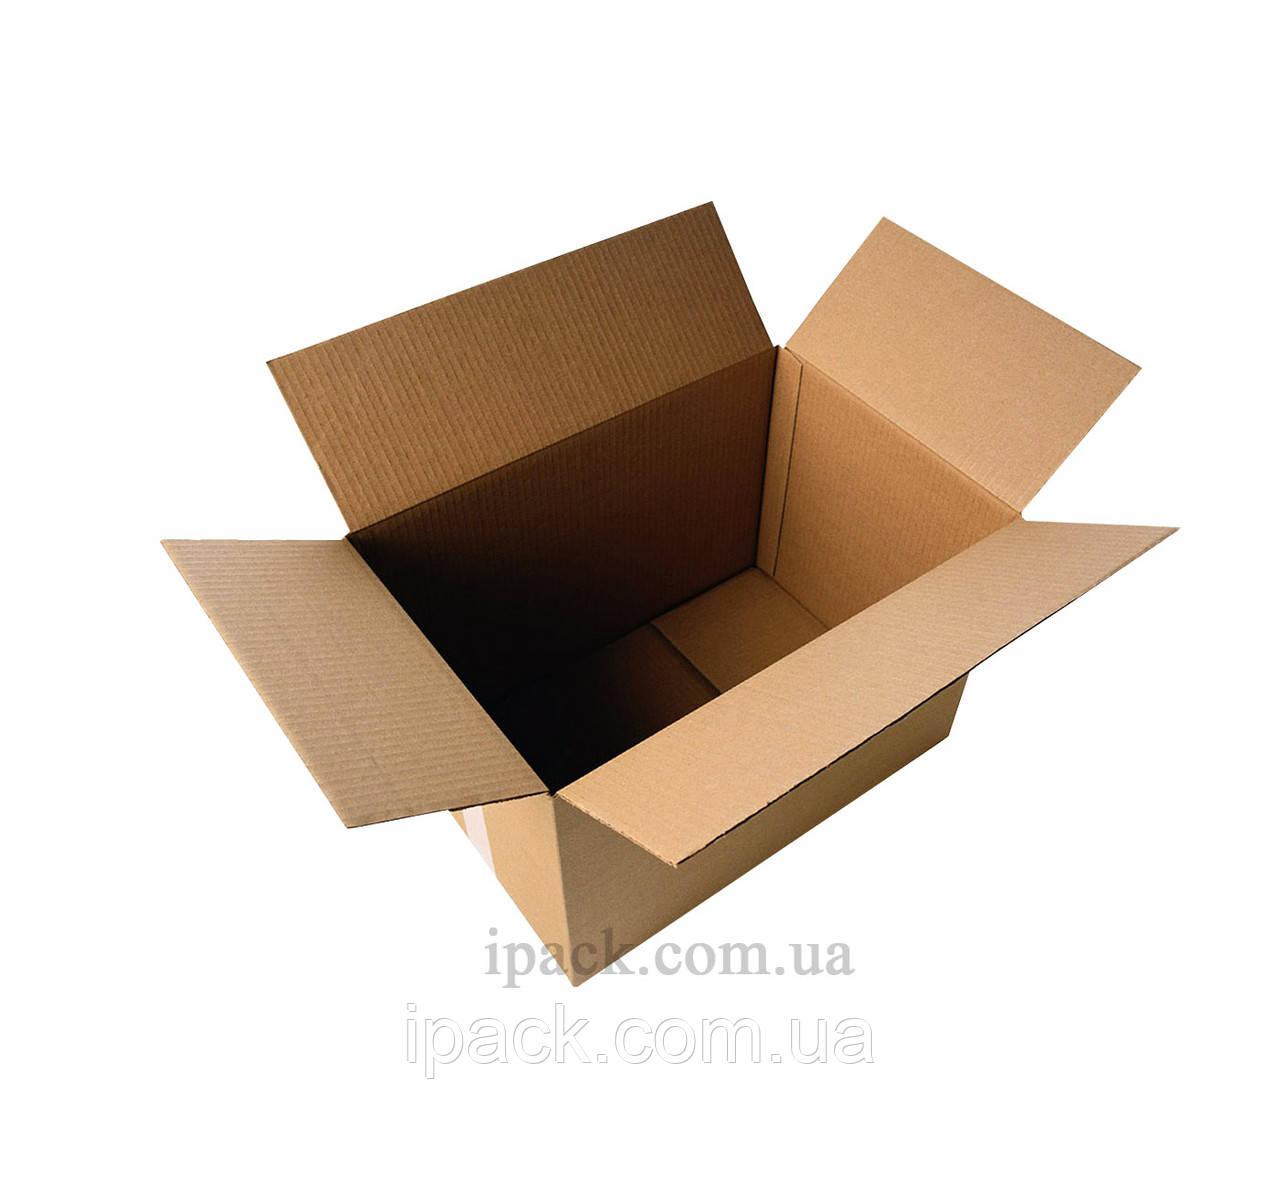 Гофроящик 200*135*235 мм, бурый, четырехклапанный картонный короб